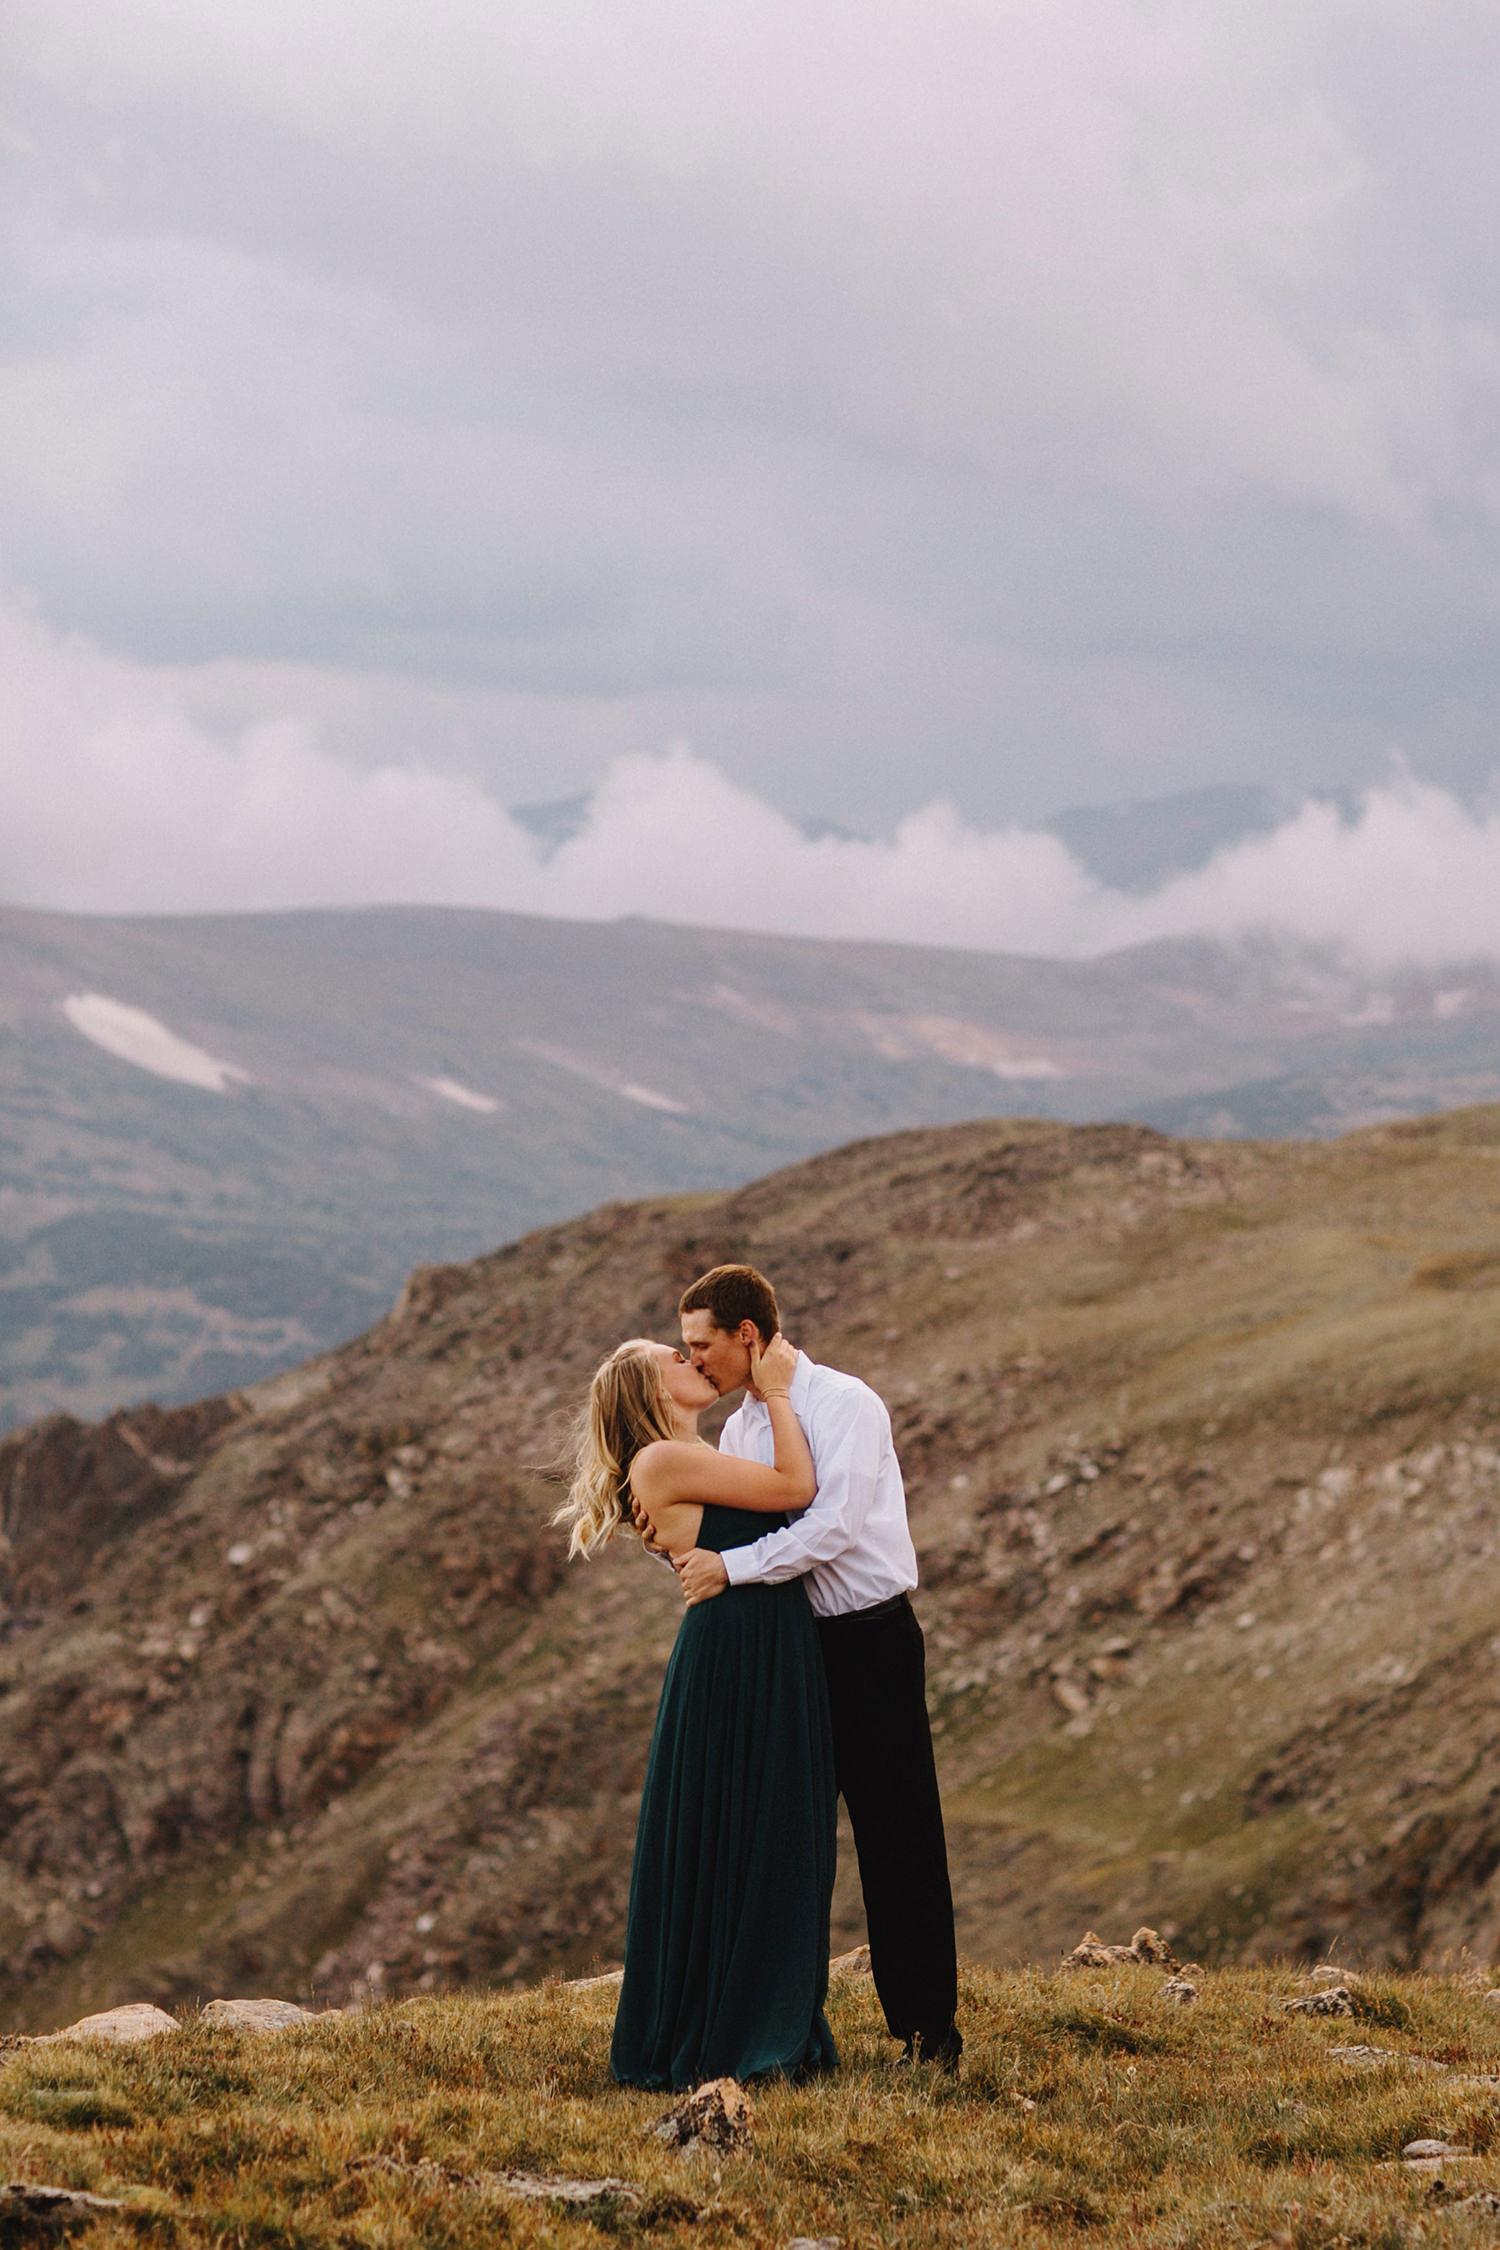 Rocky Mountain Engagement National Park Engaged Photos Wedding Elopement Portrait Mountains Trail Ridge Rd Peak Alpine Dress Lulus Rules Permit Photo Adventure Love Couples Destination Liz Osban photography Cheyenne Wyoming11.jpg